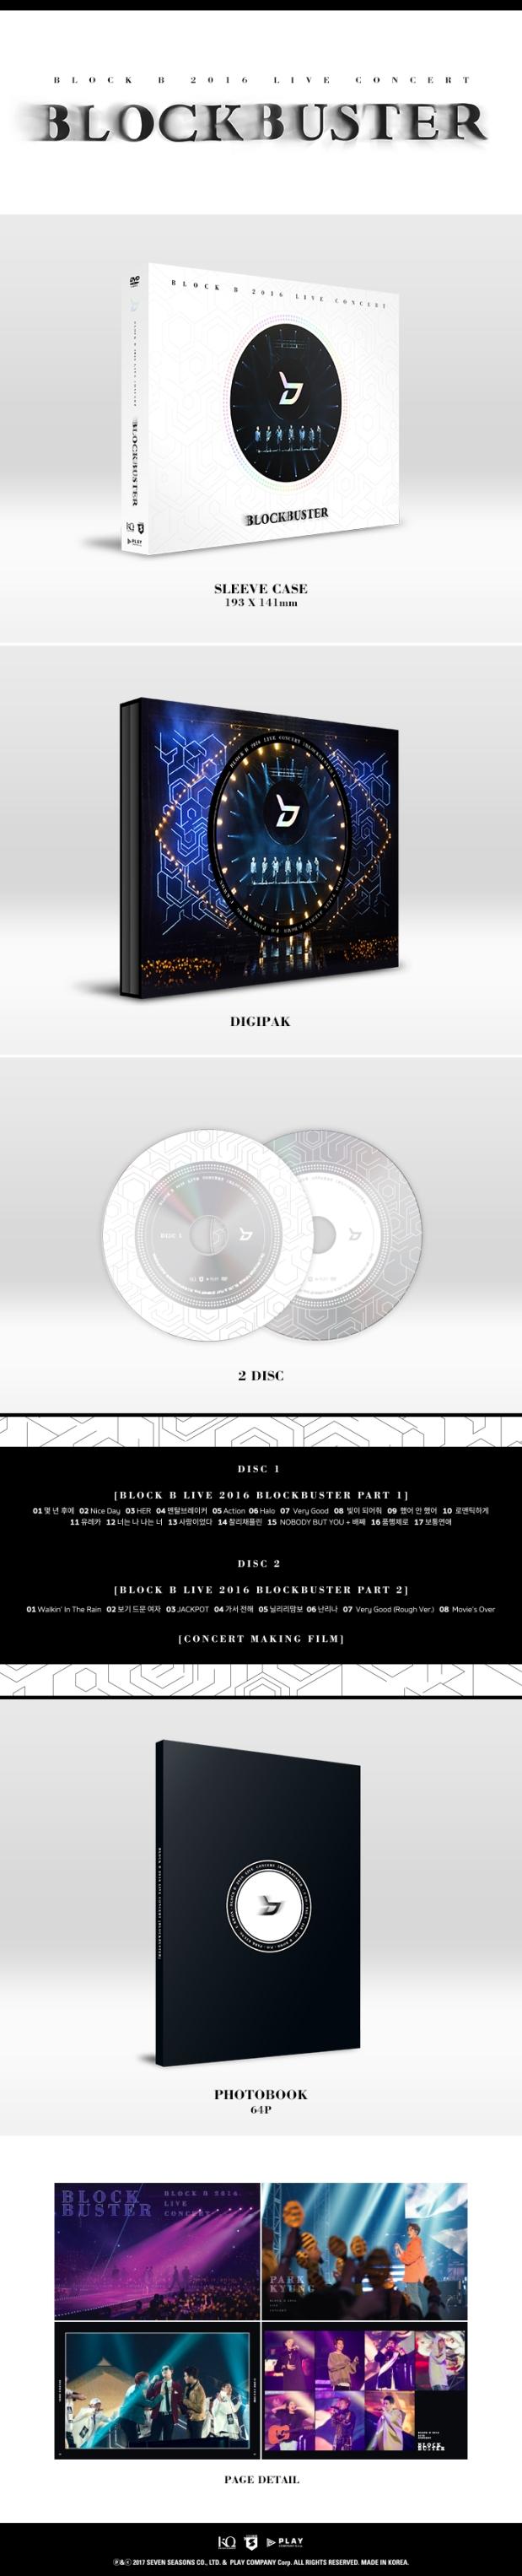 block-b-2016-live-concert-blockbuster-dvd